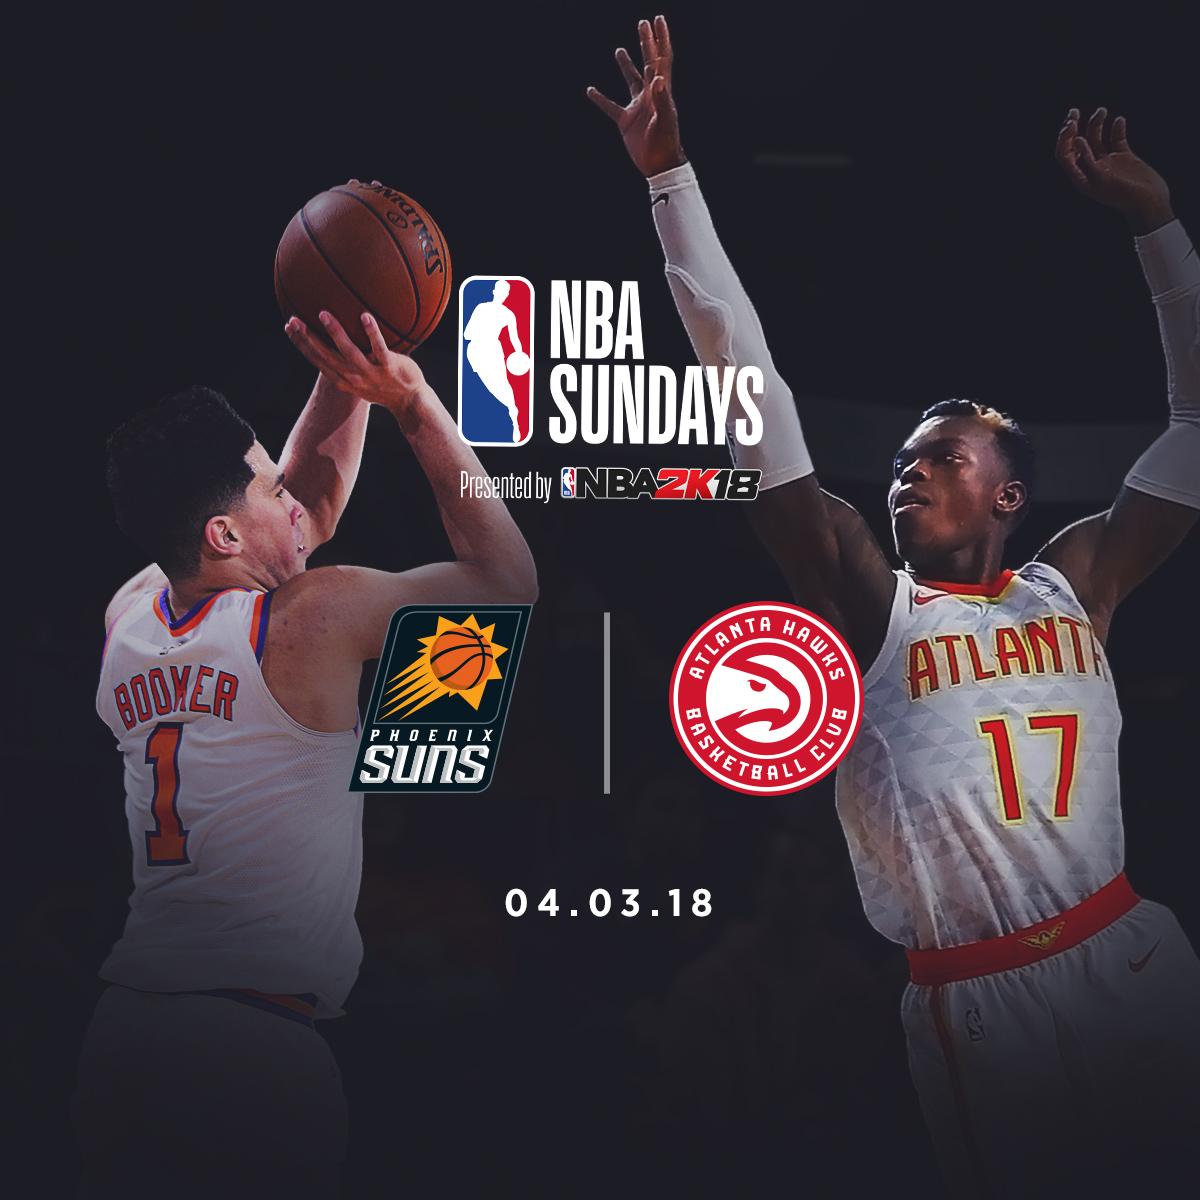 NBA Sundays: Phoenix Suns @ Atlanta Hawks